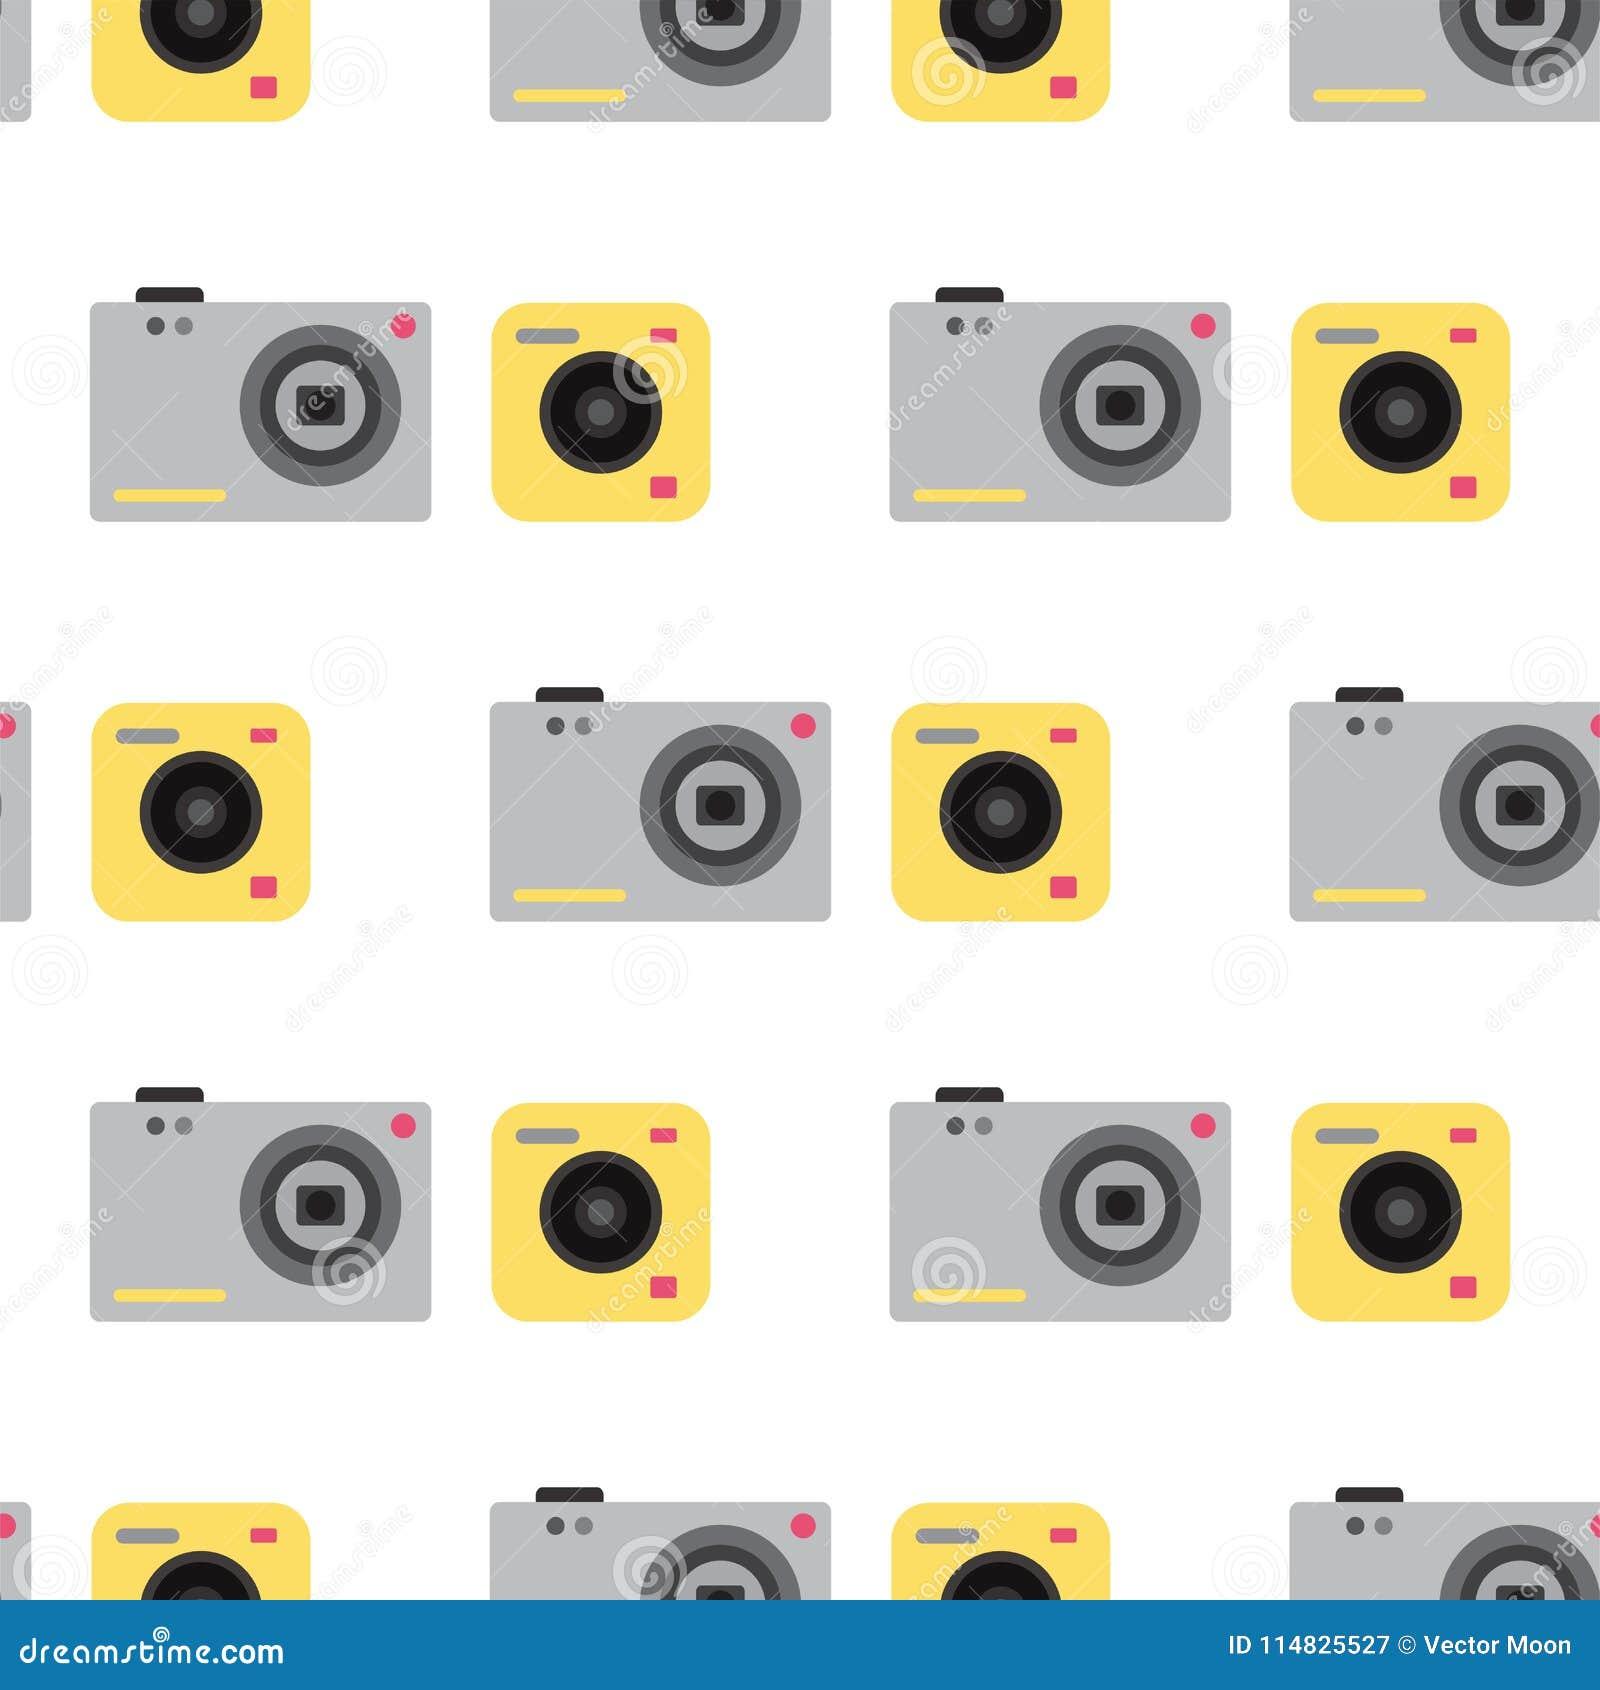 Camera Photo Vector Studio Flat Optic Lenses Types Objective